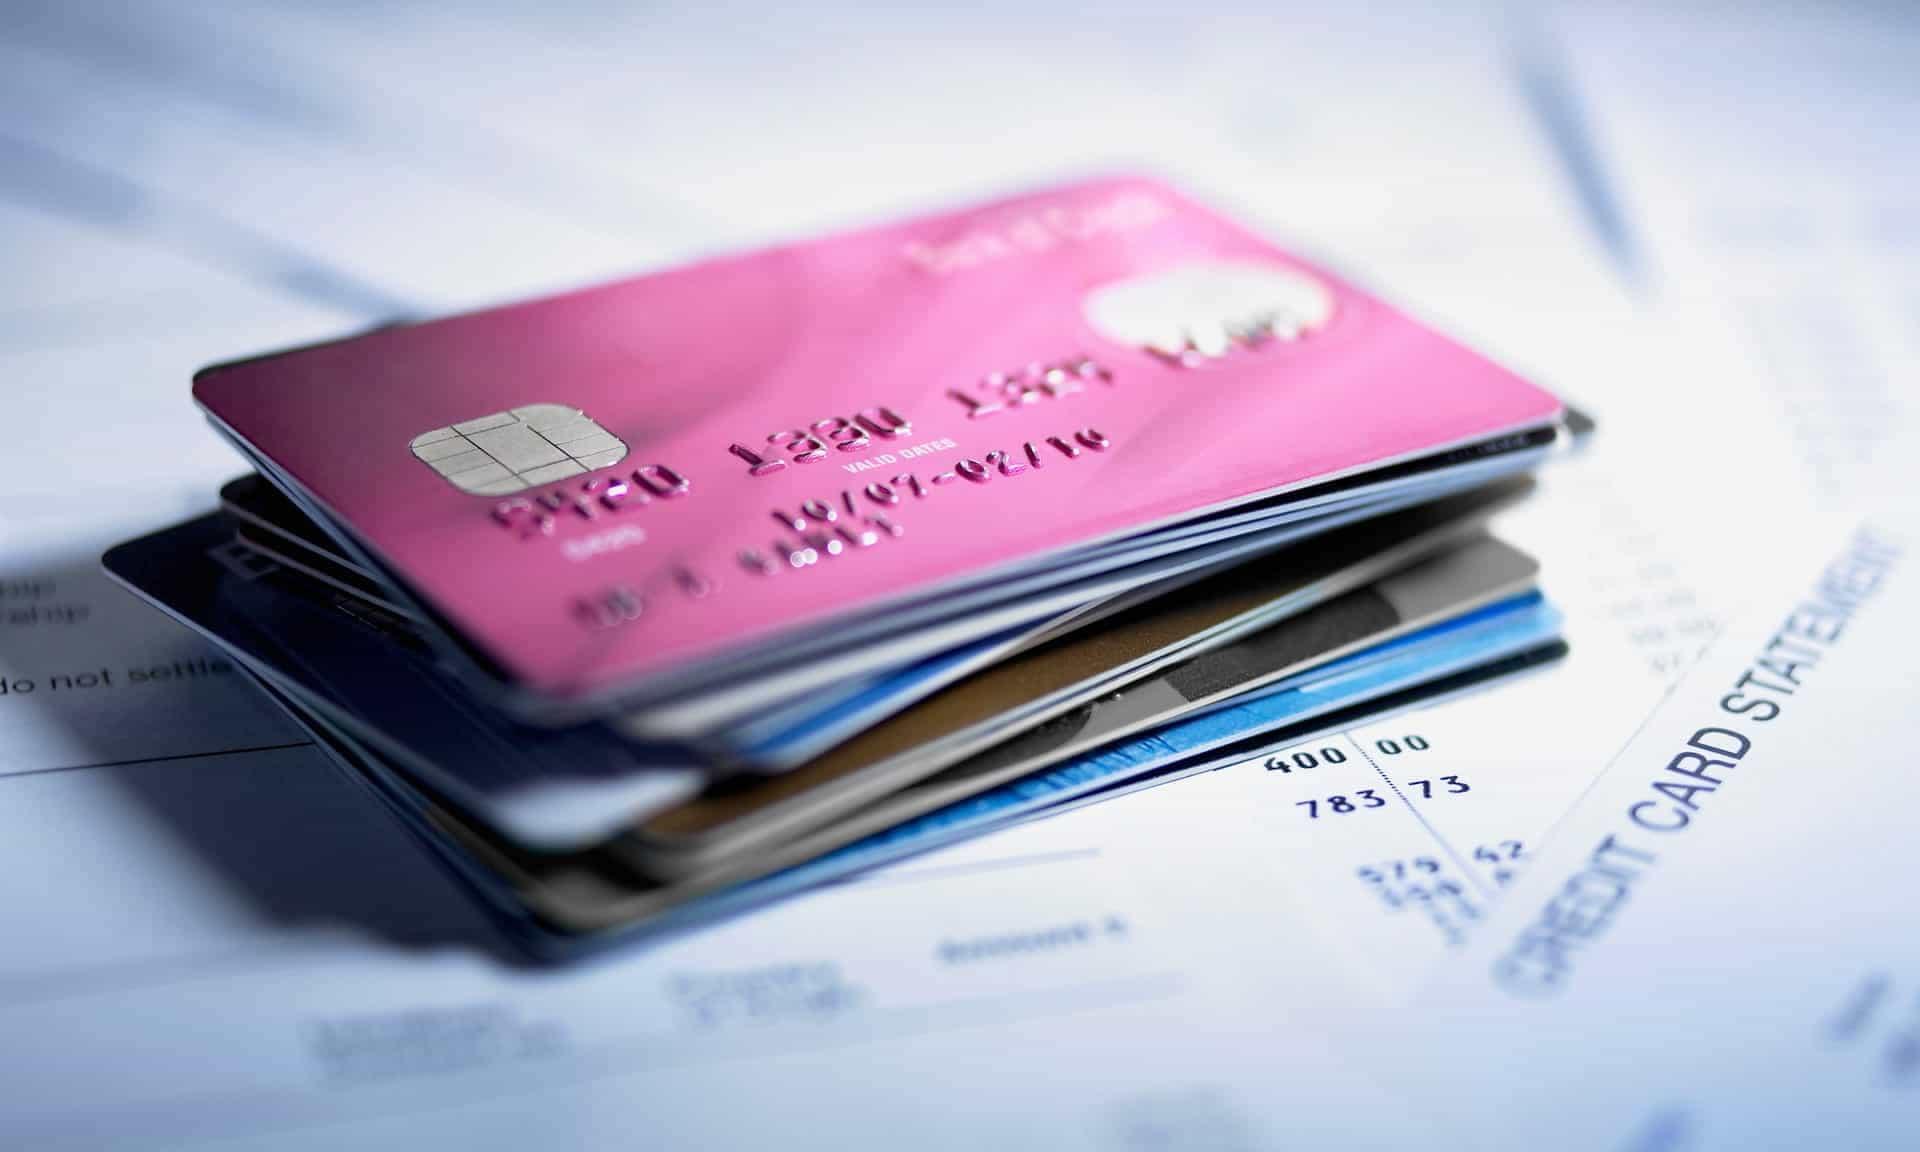 15 cicilan tanpa kartu kredit paylater